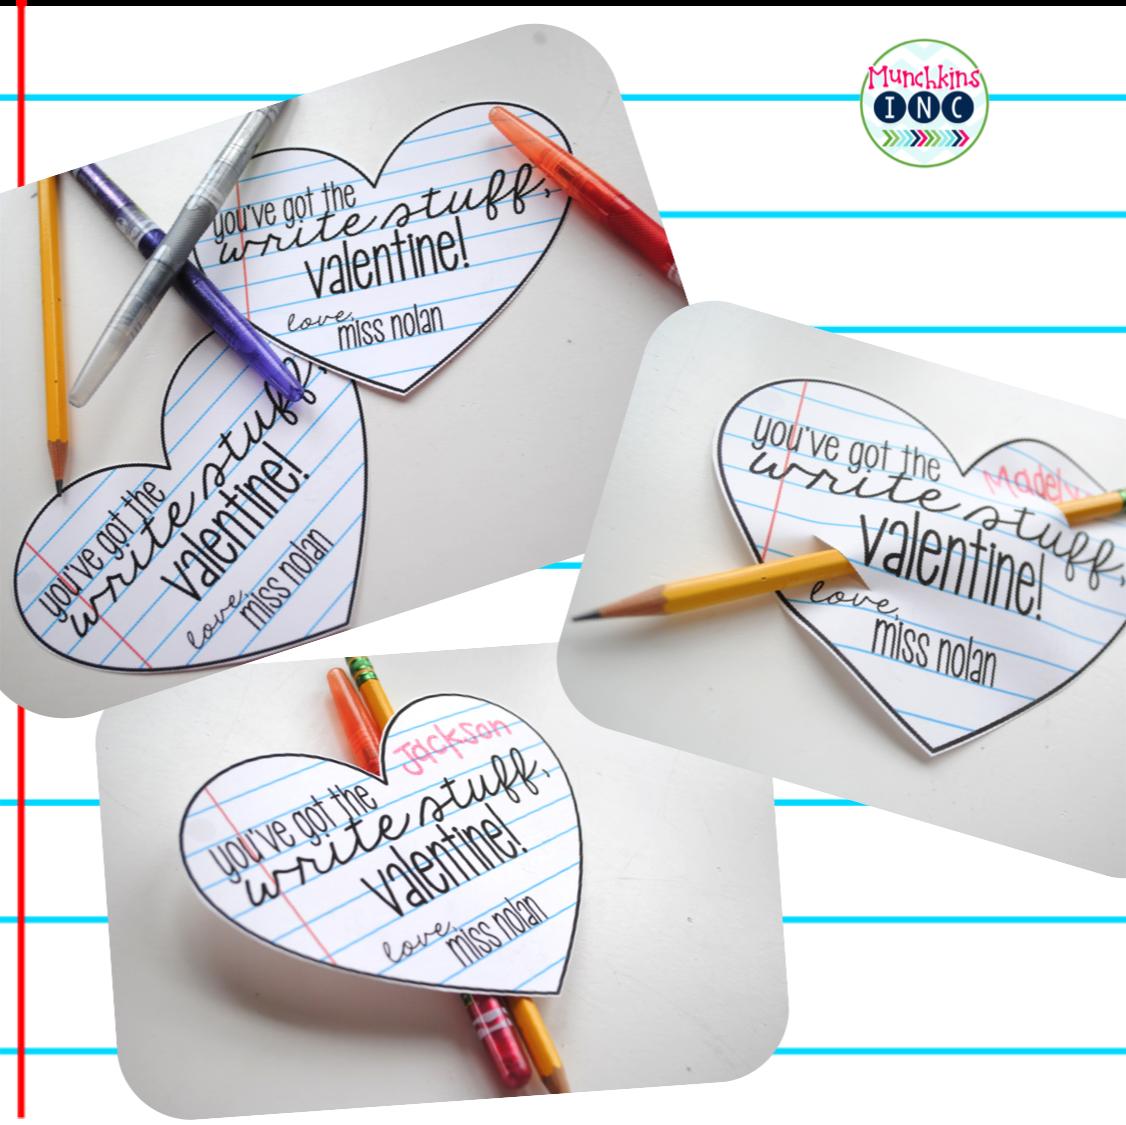 https://www.teacherspayteachers.com/Product/Youve-Got-the-WRITE-Stuff-Valentine-FREEBIE-1684440